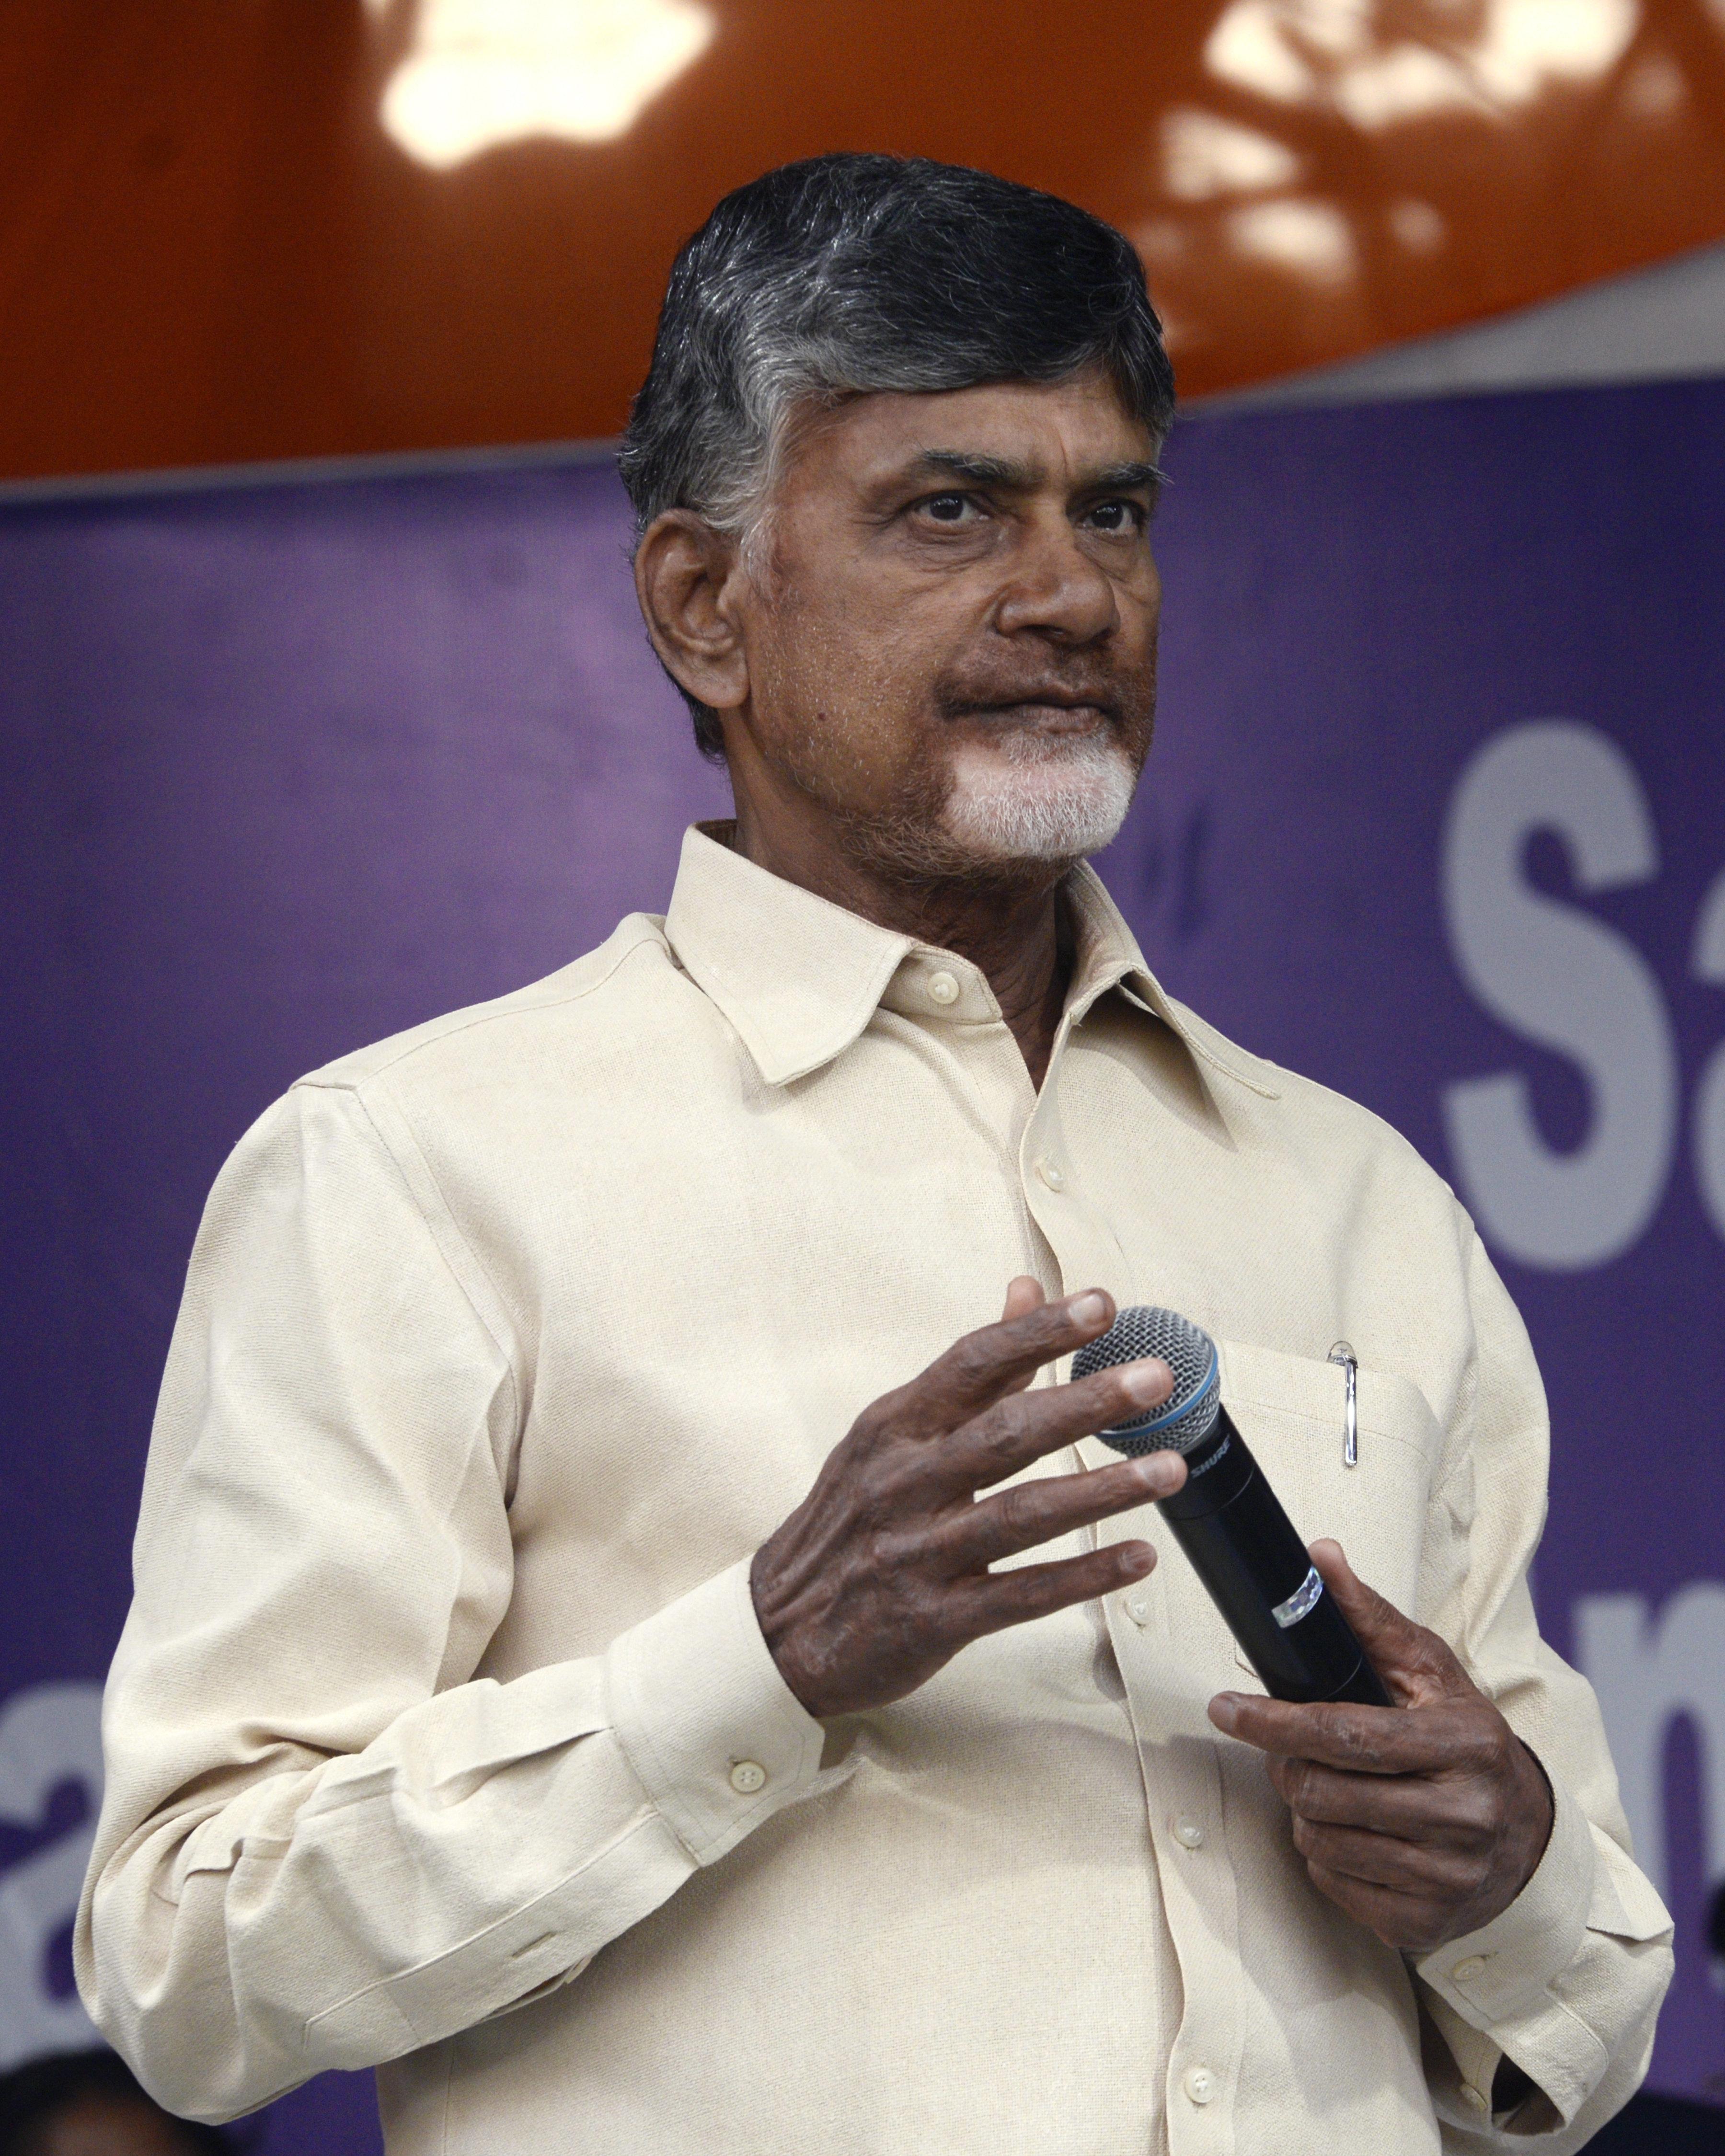 Chandrababu Naidu Begins Hunger Strike Demanding Special Status For Andhra